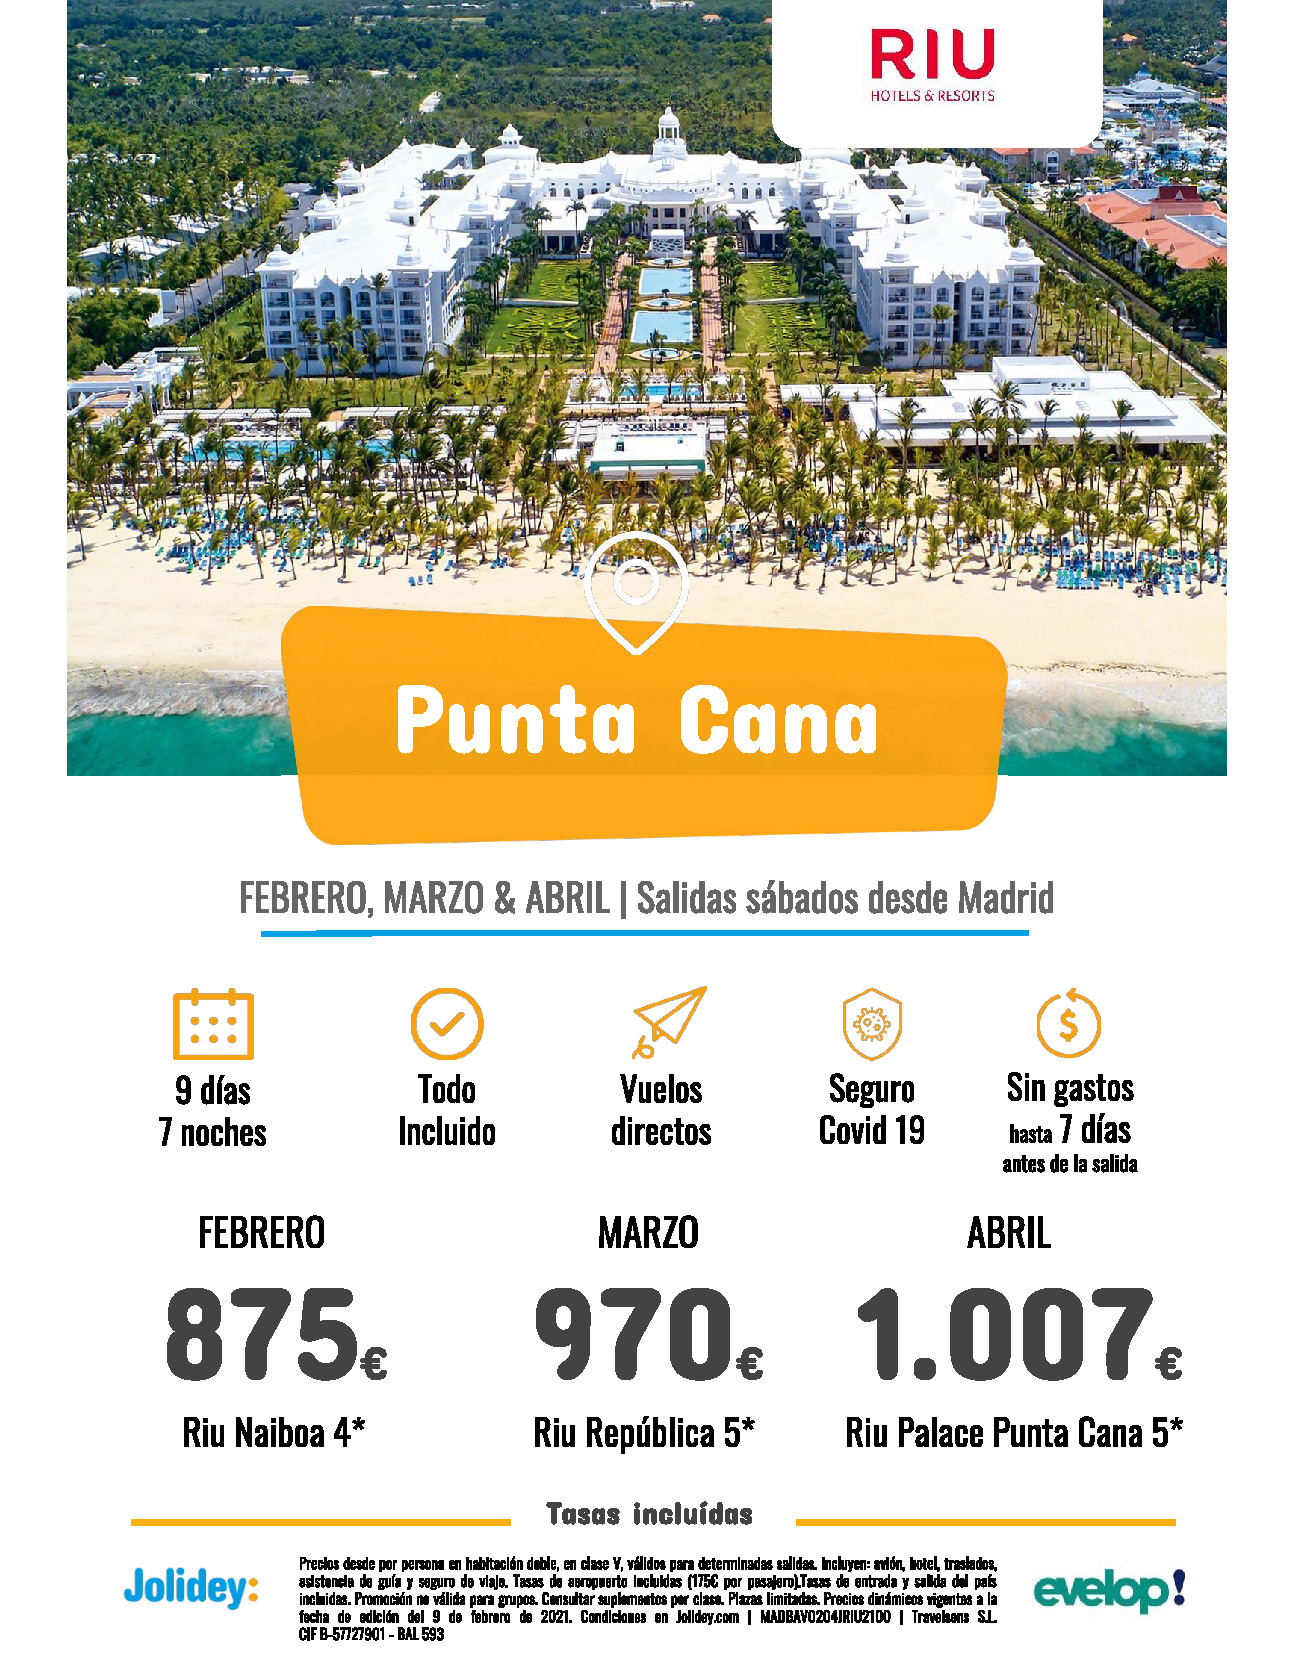 Ofertas Jolidey Punta Cana Febrero a Abril 2021 hoteles Riu vuelo directo desde Madrid